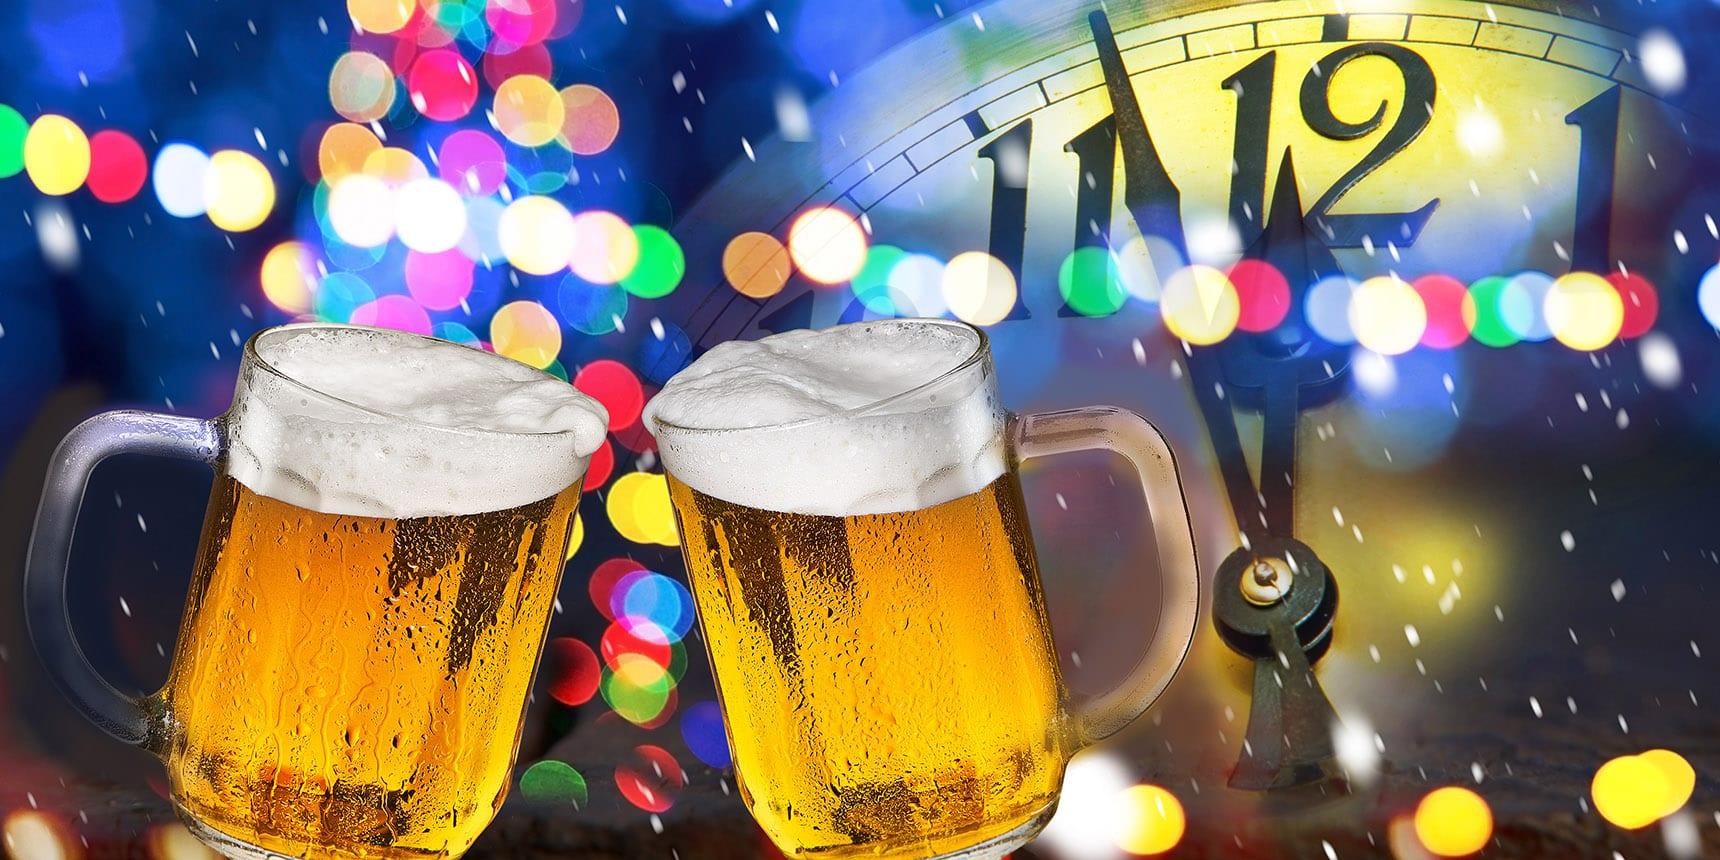 Utah Beer News 2020 Year in Review